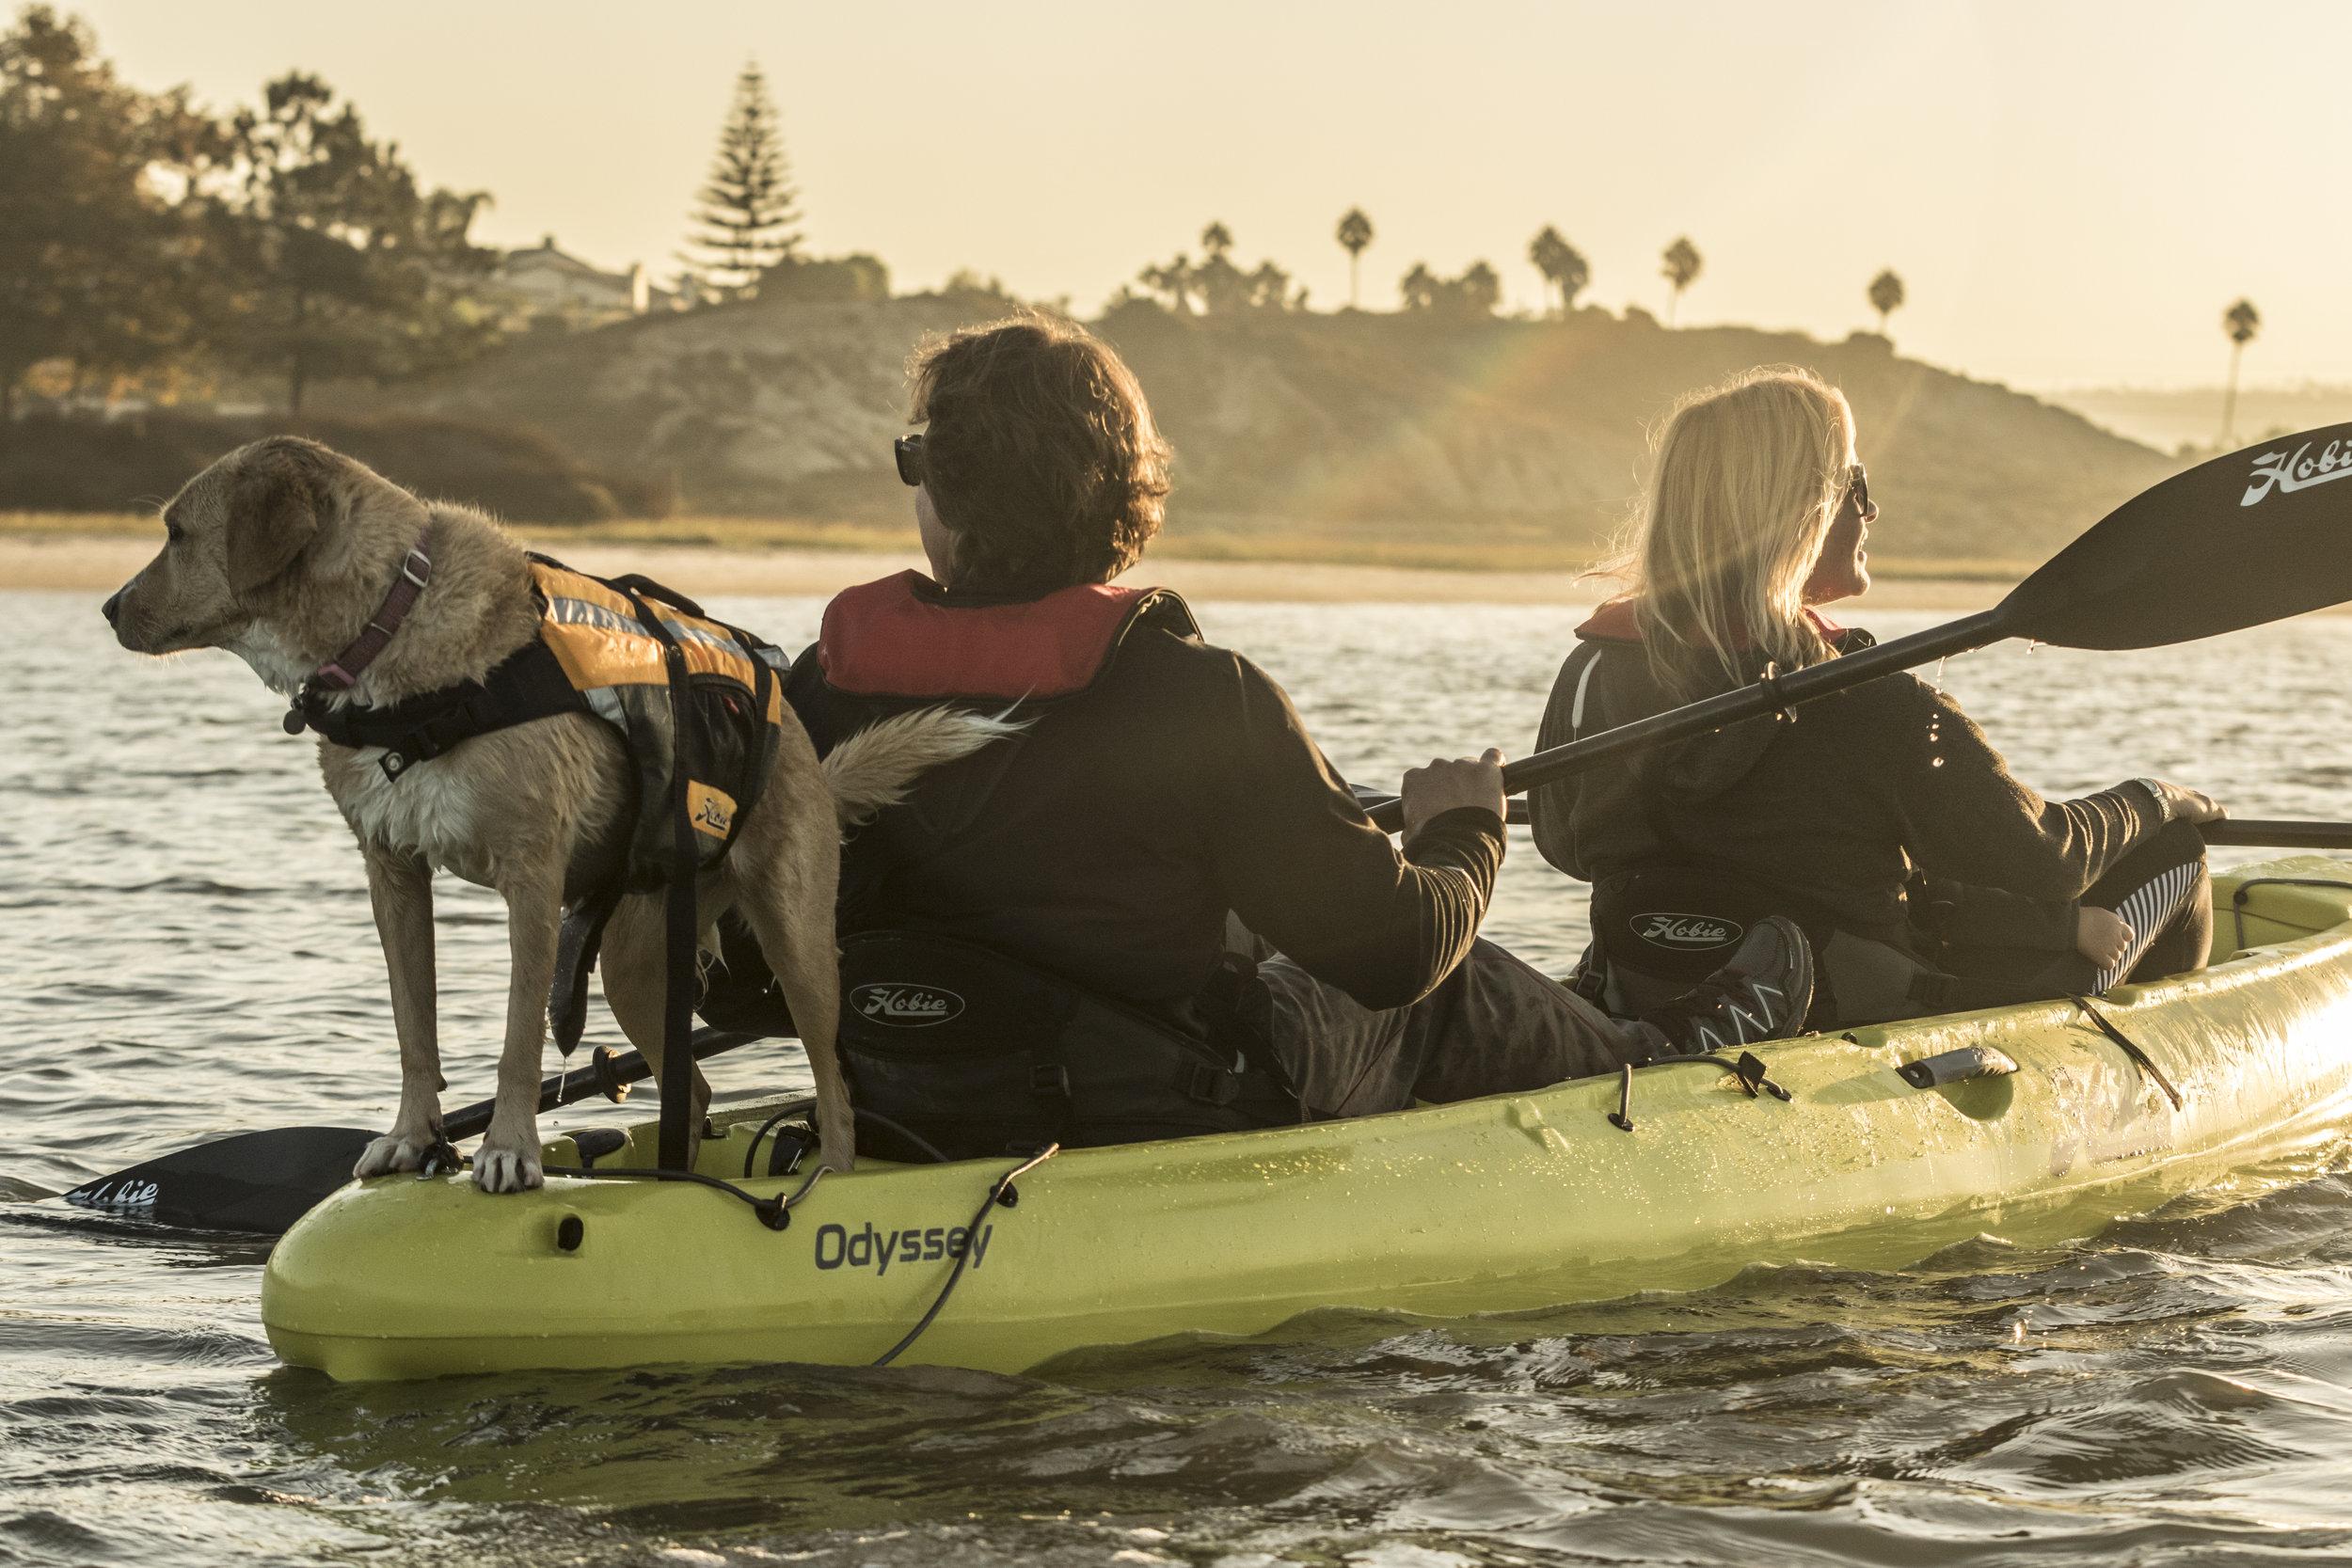 Odyssey_action_seagrass_lagoon_jim_dog_sepia.jpg